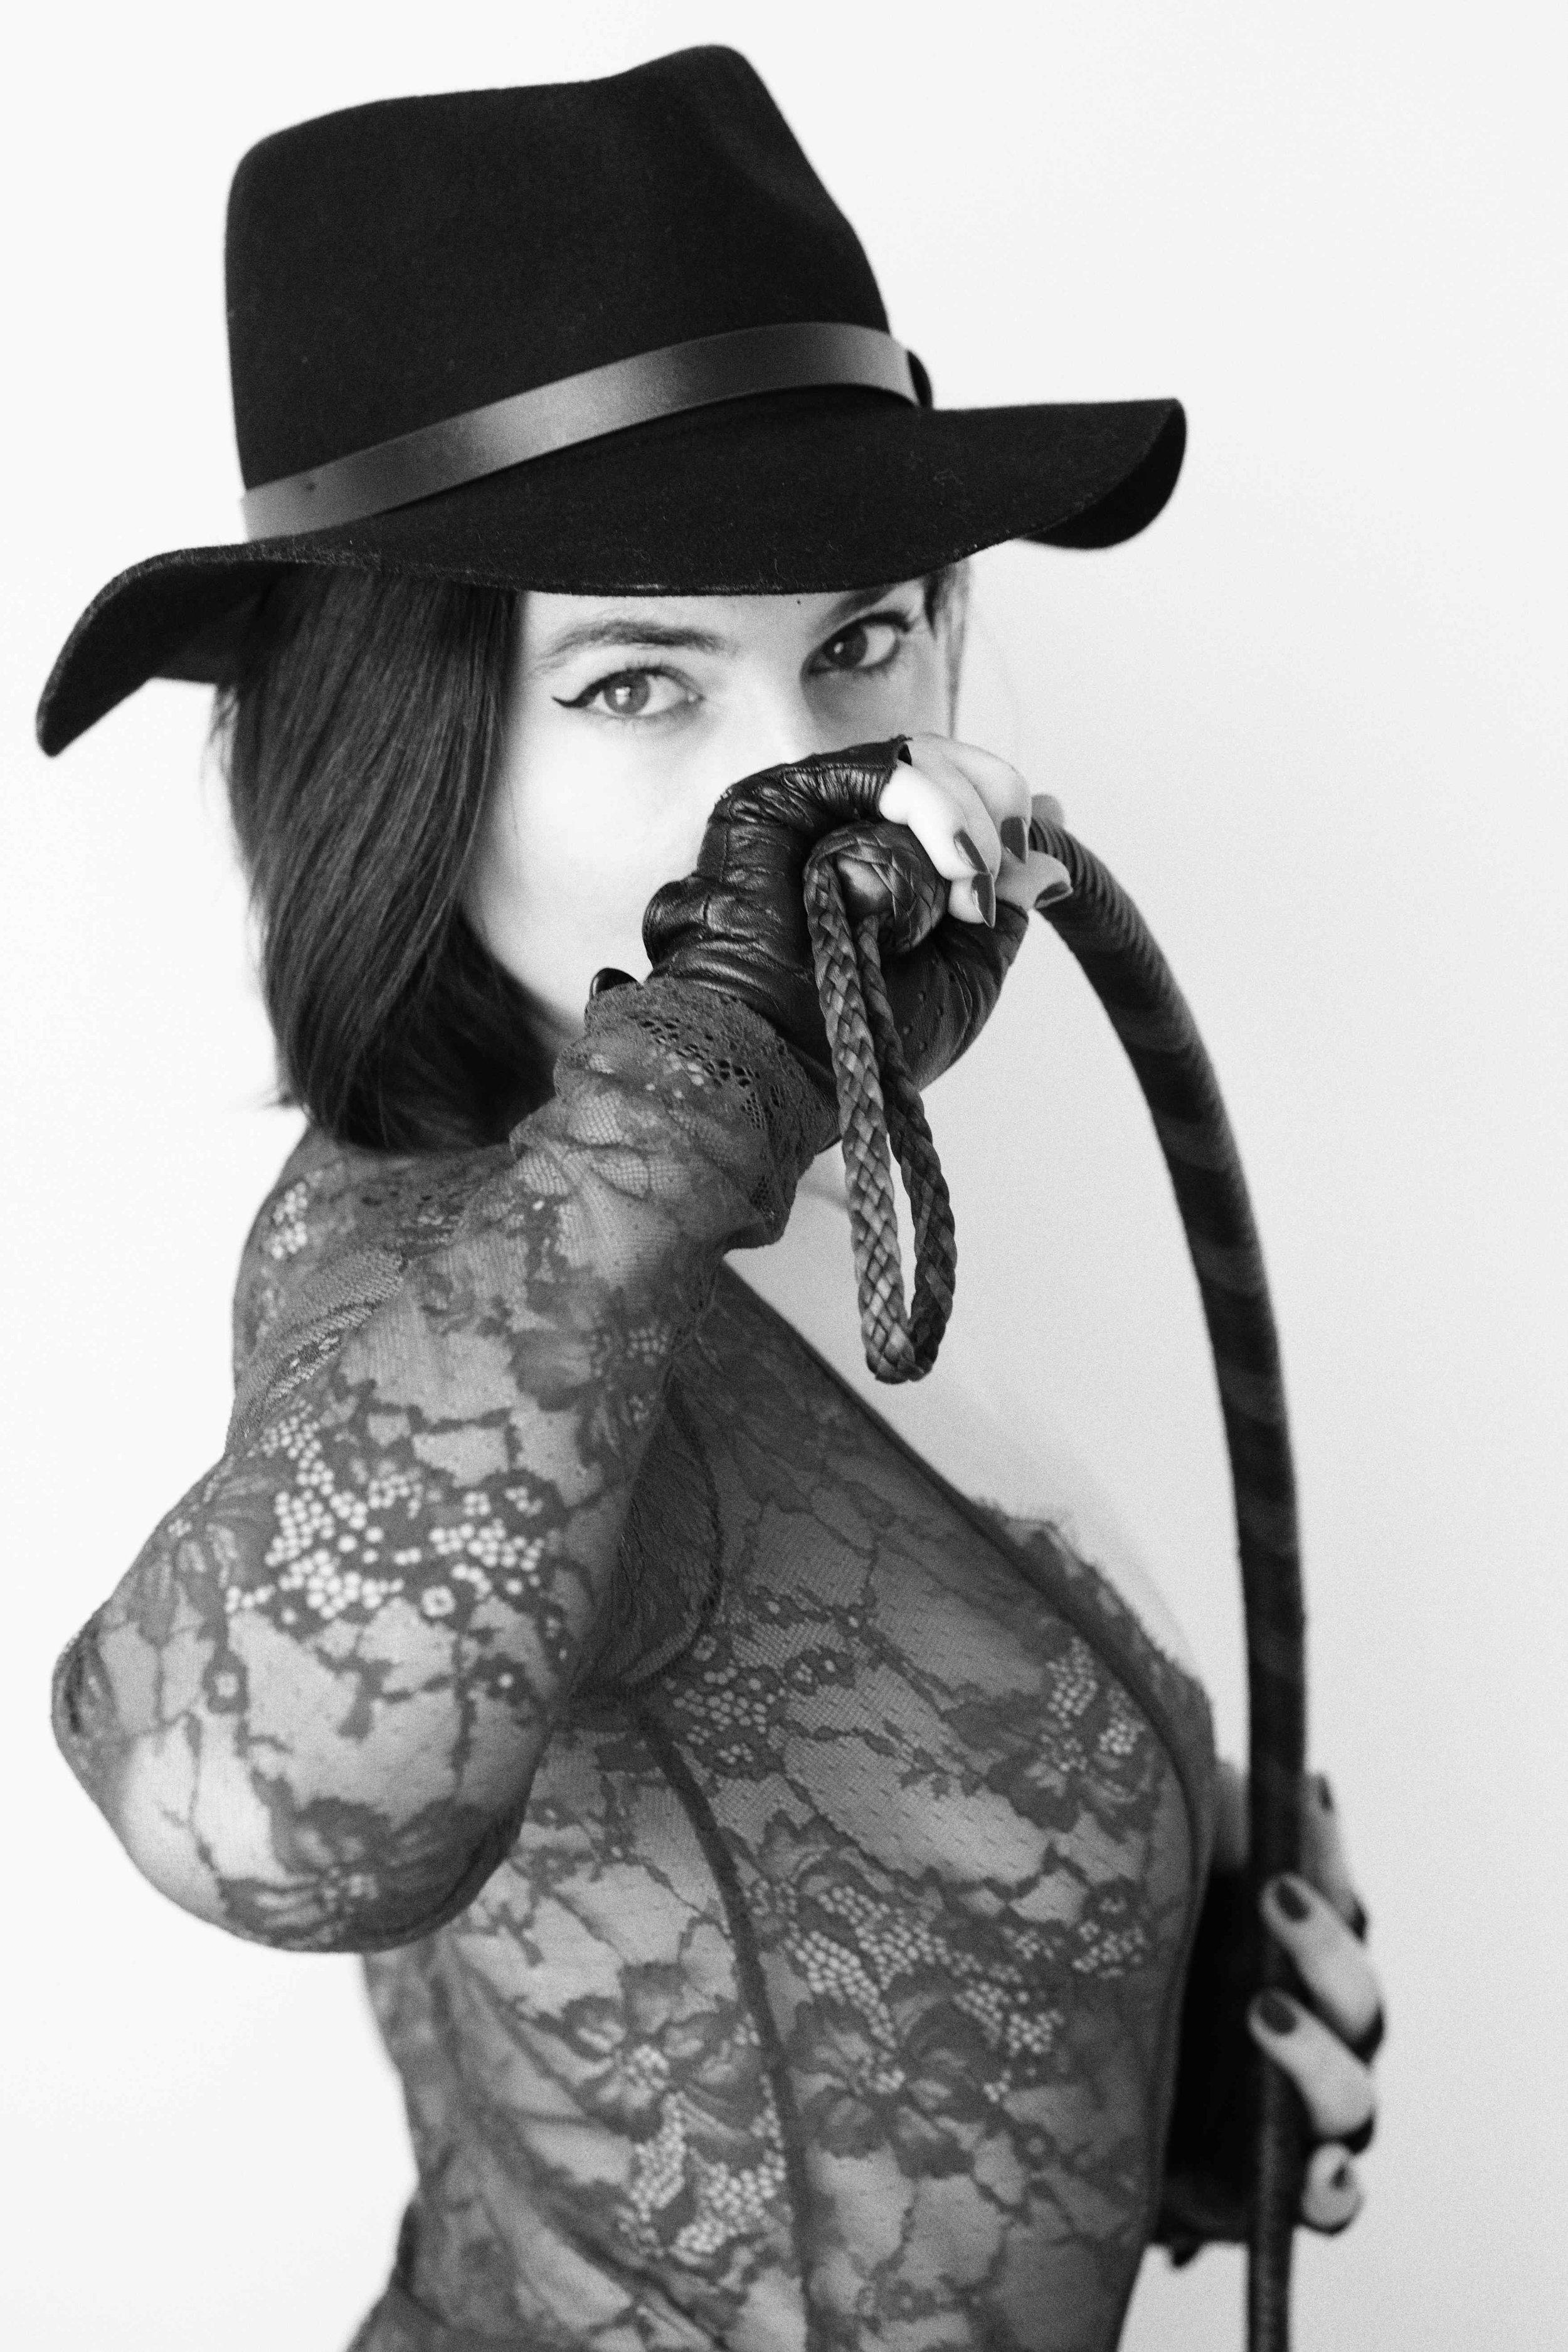 Goddess Aviva Diamond, professional and lifestyle dominatrix